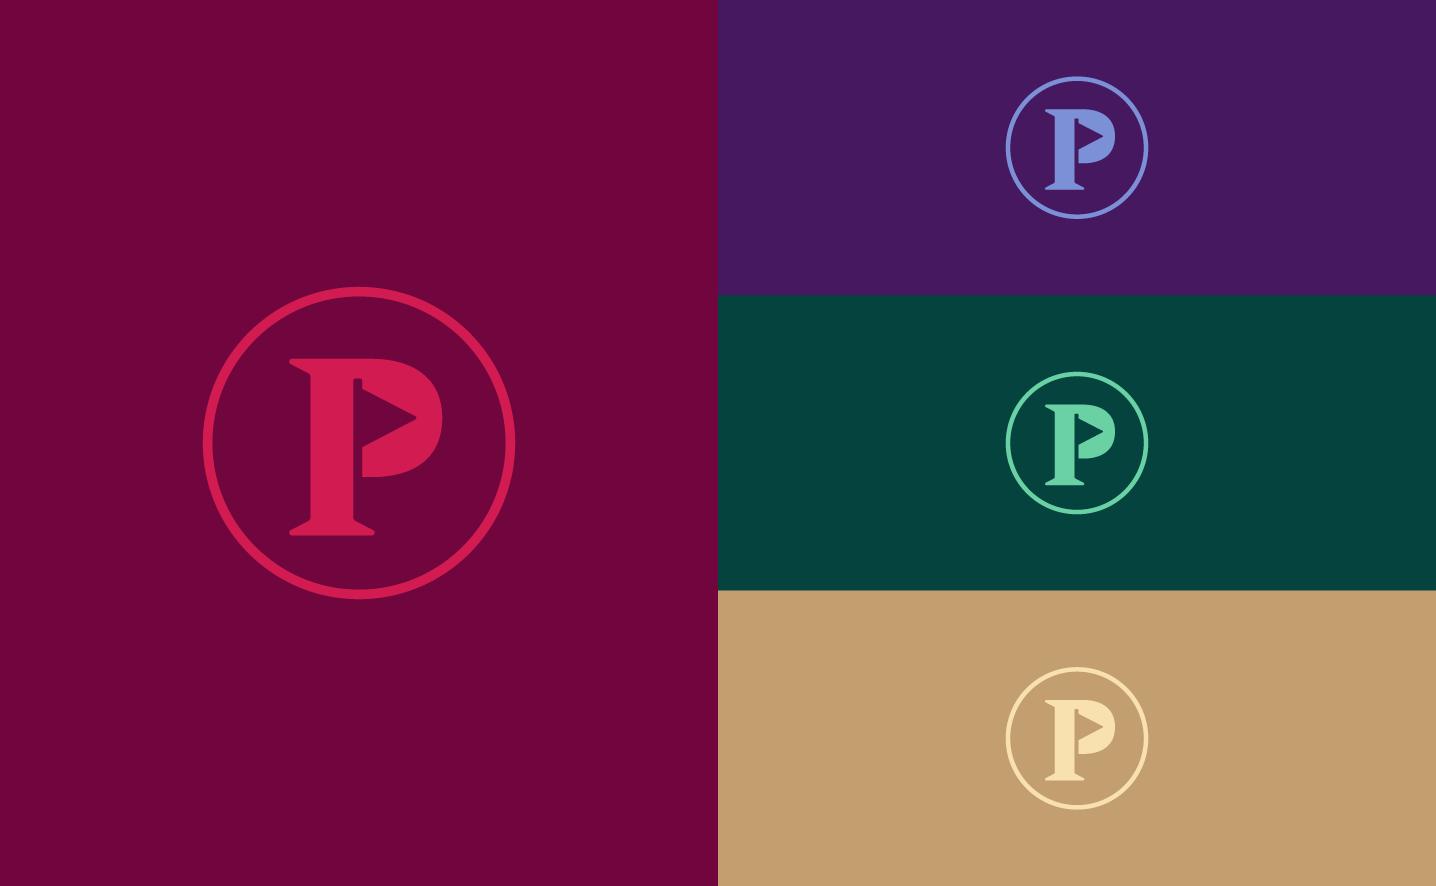 Puttshack-Icon-logo-design